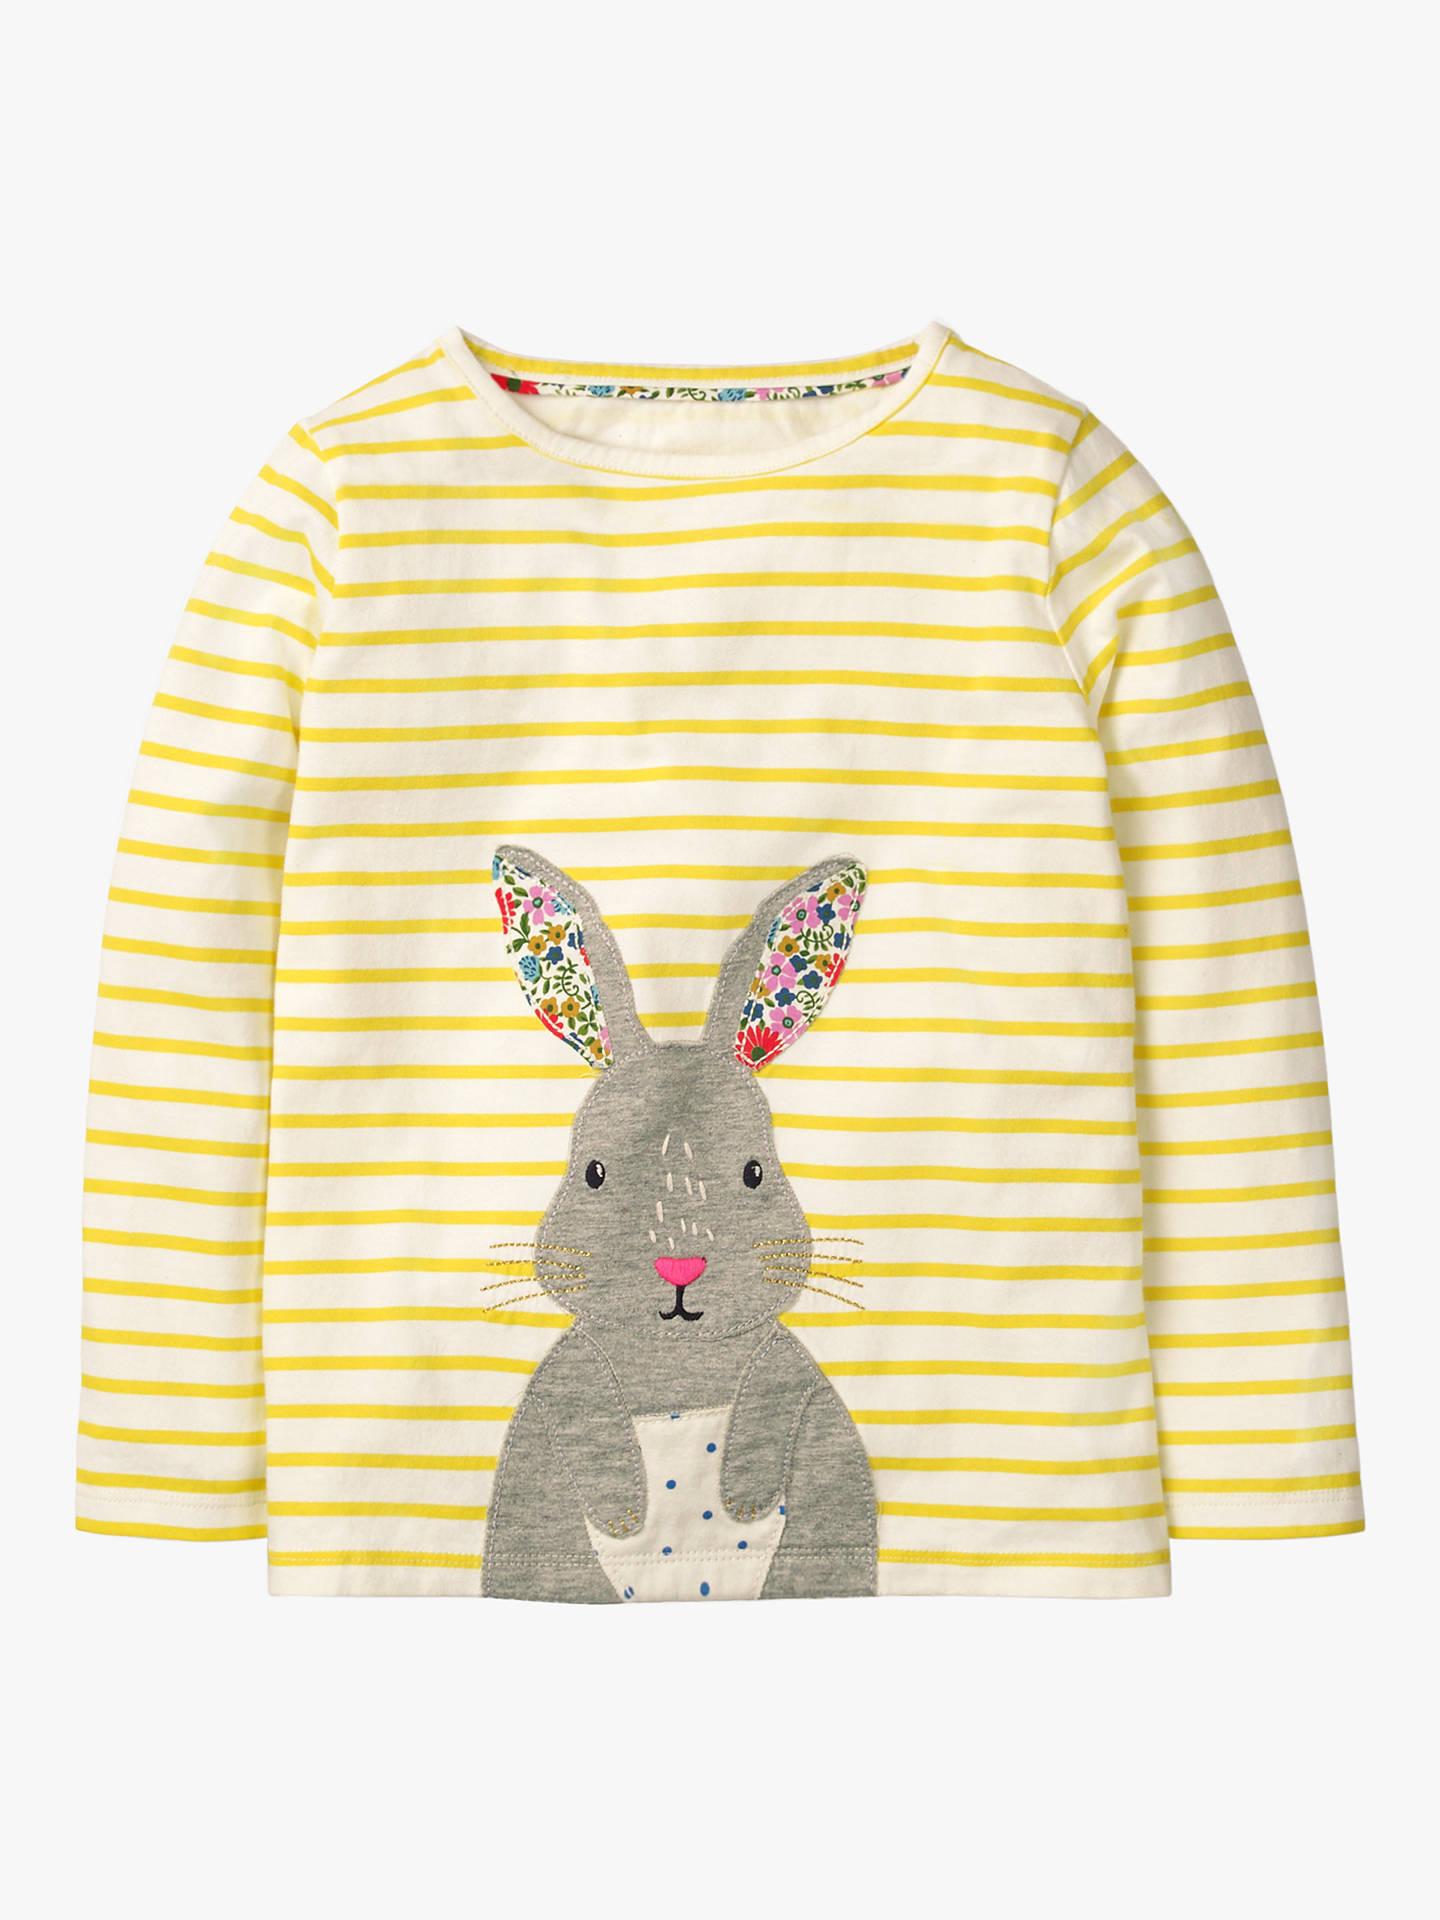 5cbbda8895 Mini Boden Girls' Bunny Applique T-Shirt, Yellow at John Lewis ...